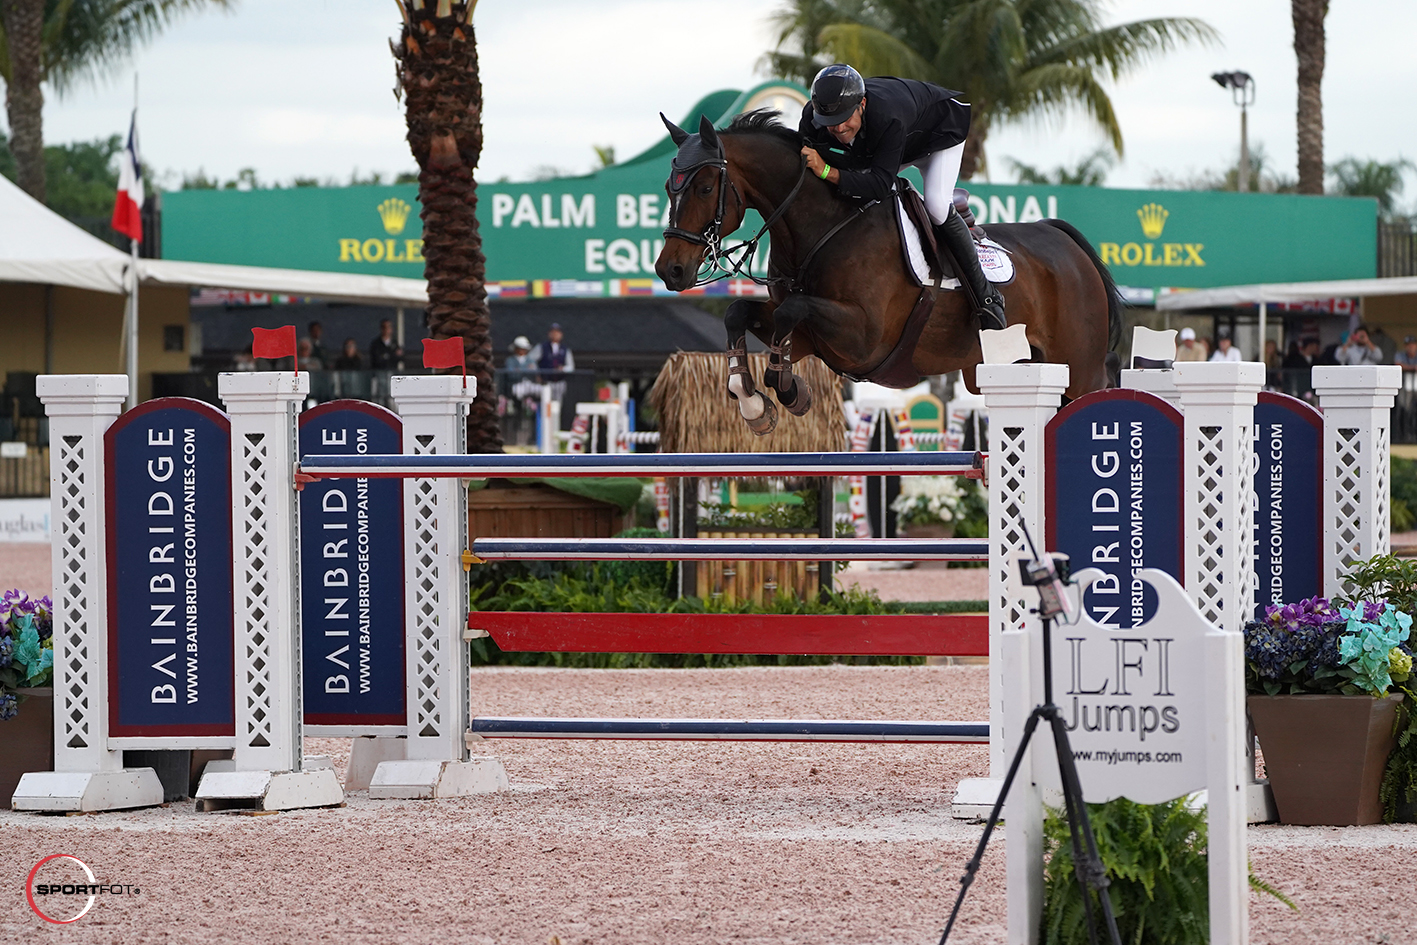 Rodrigo Lambre and Chapilot. Photo © Sportfot